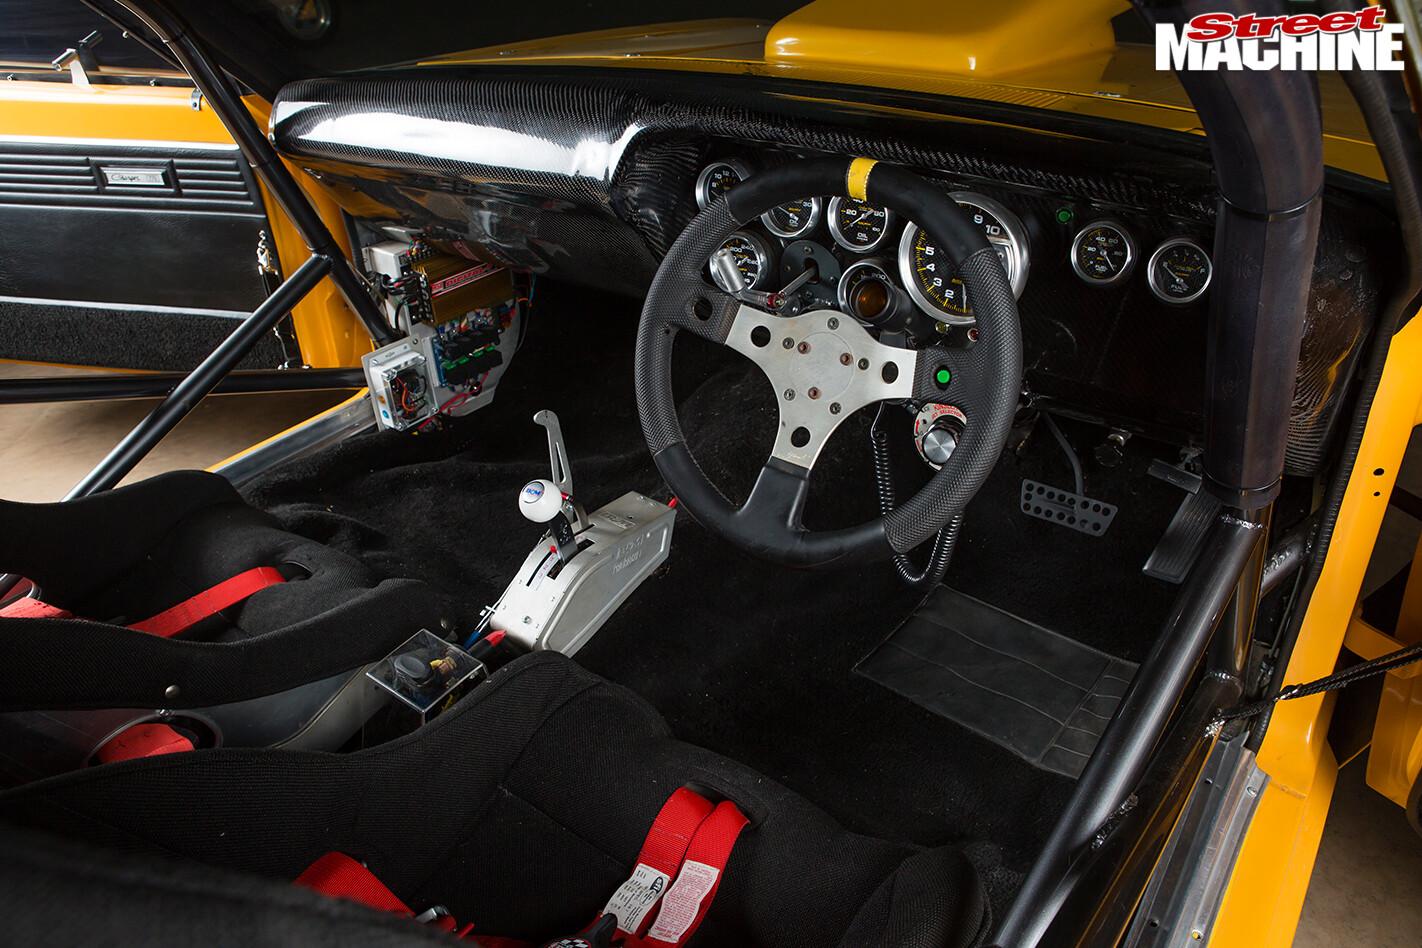 Chrysler -valiant -e 55-charger -interior -front